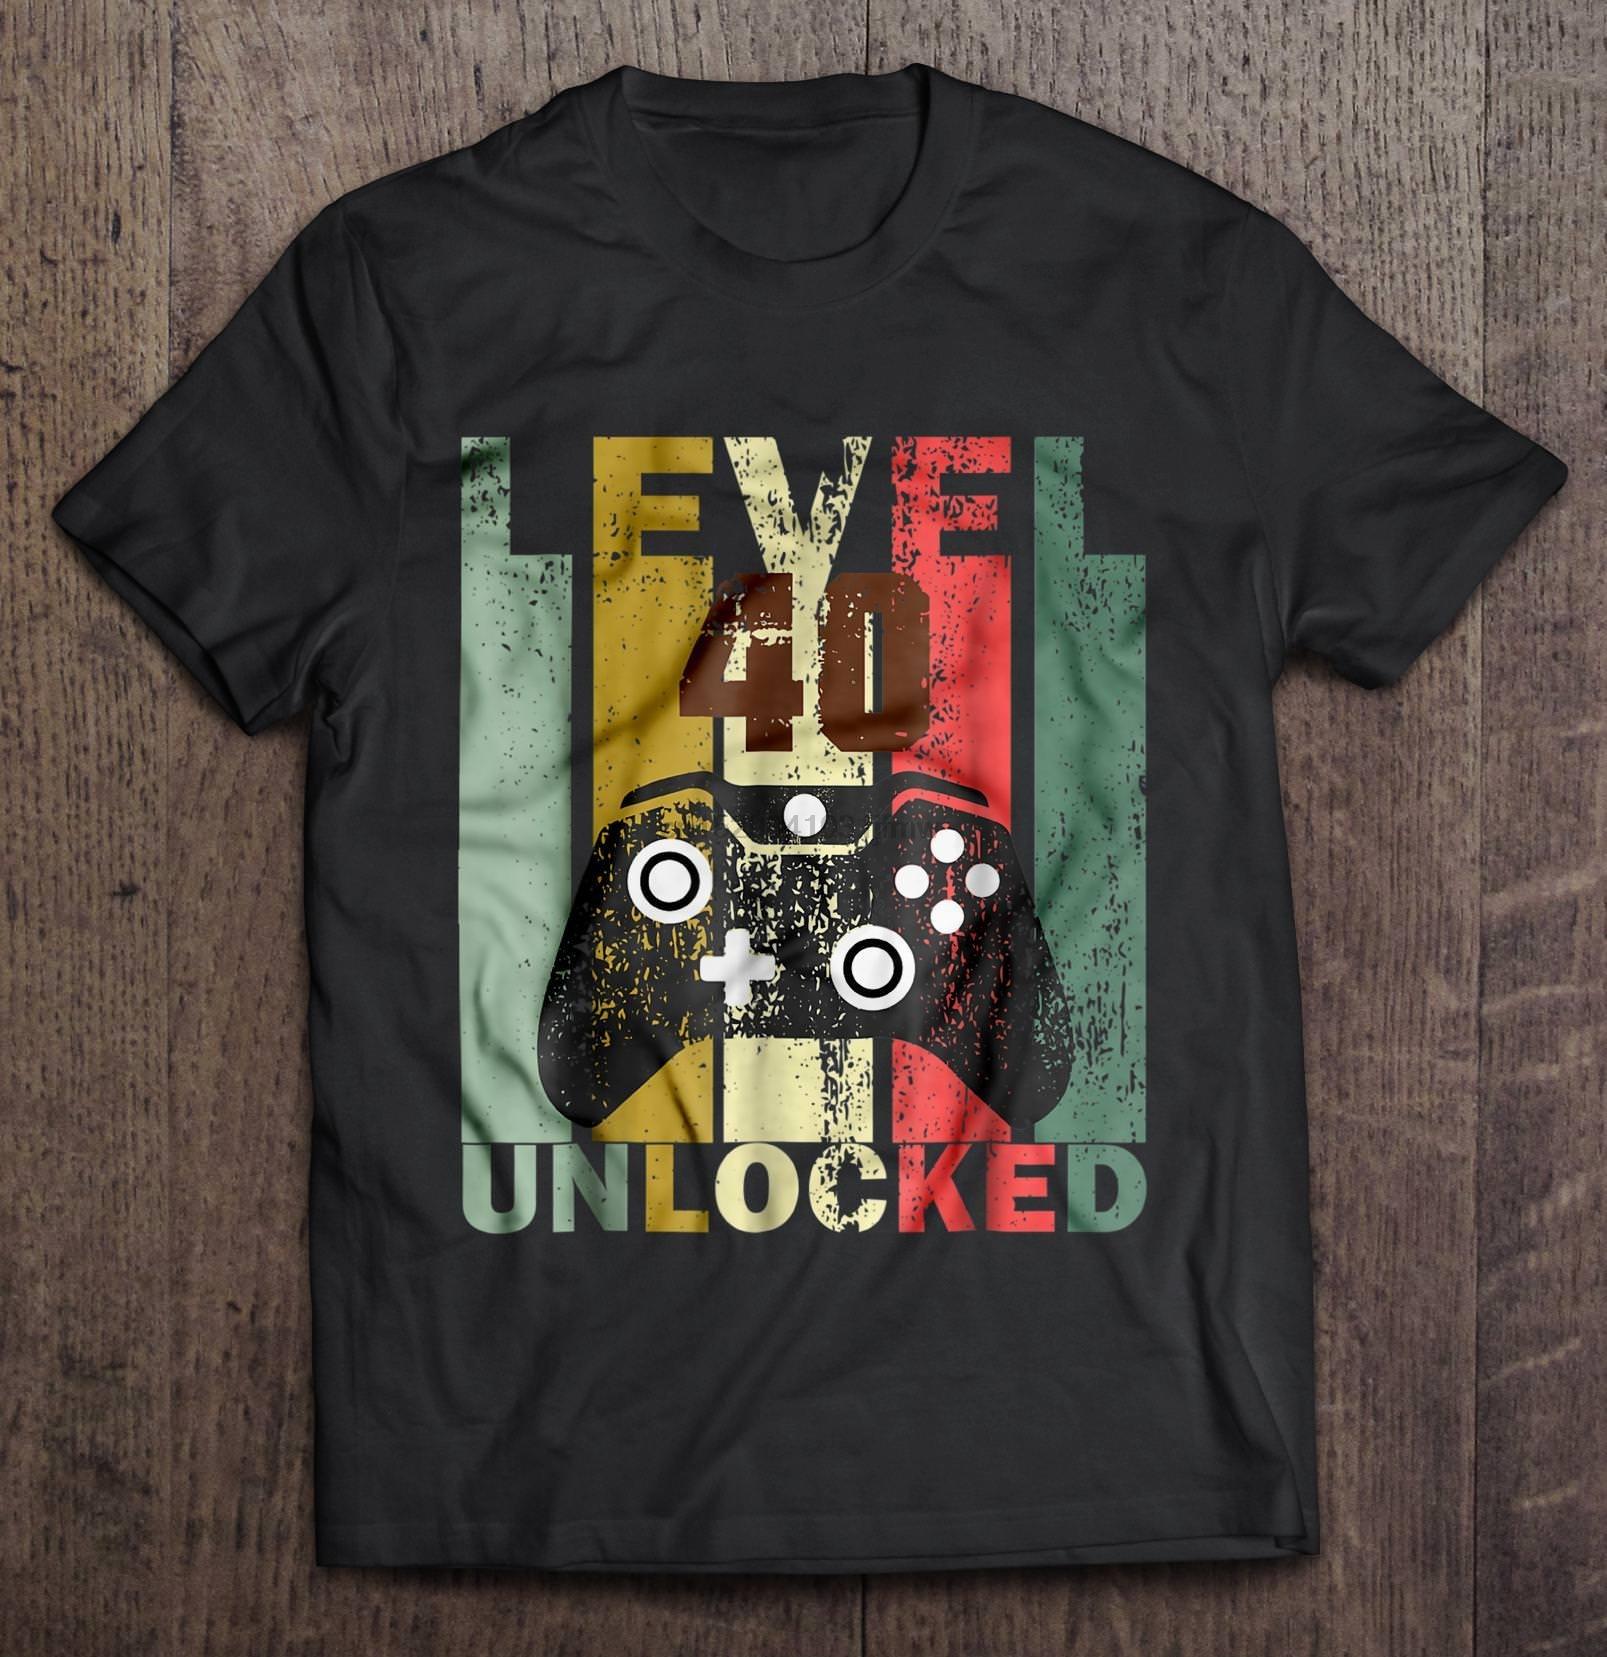 Funny 40 Year Old Banger Classic Car Motif for 40th Birthday mens t-shirt tshirt